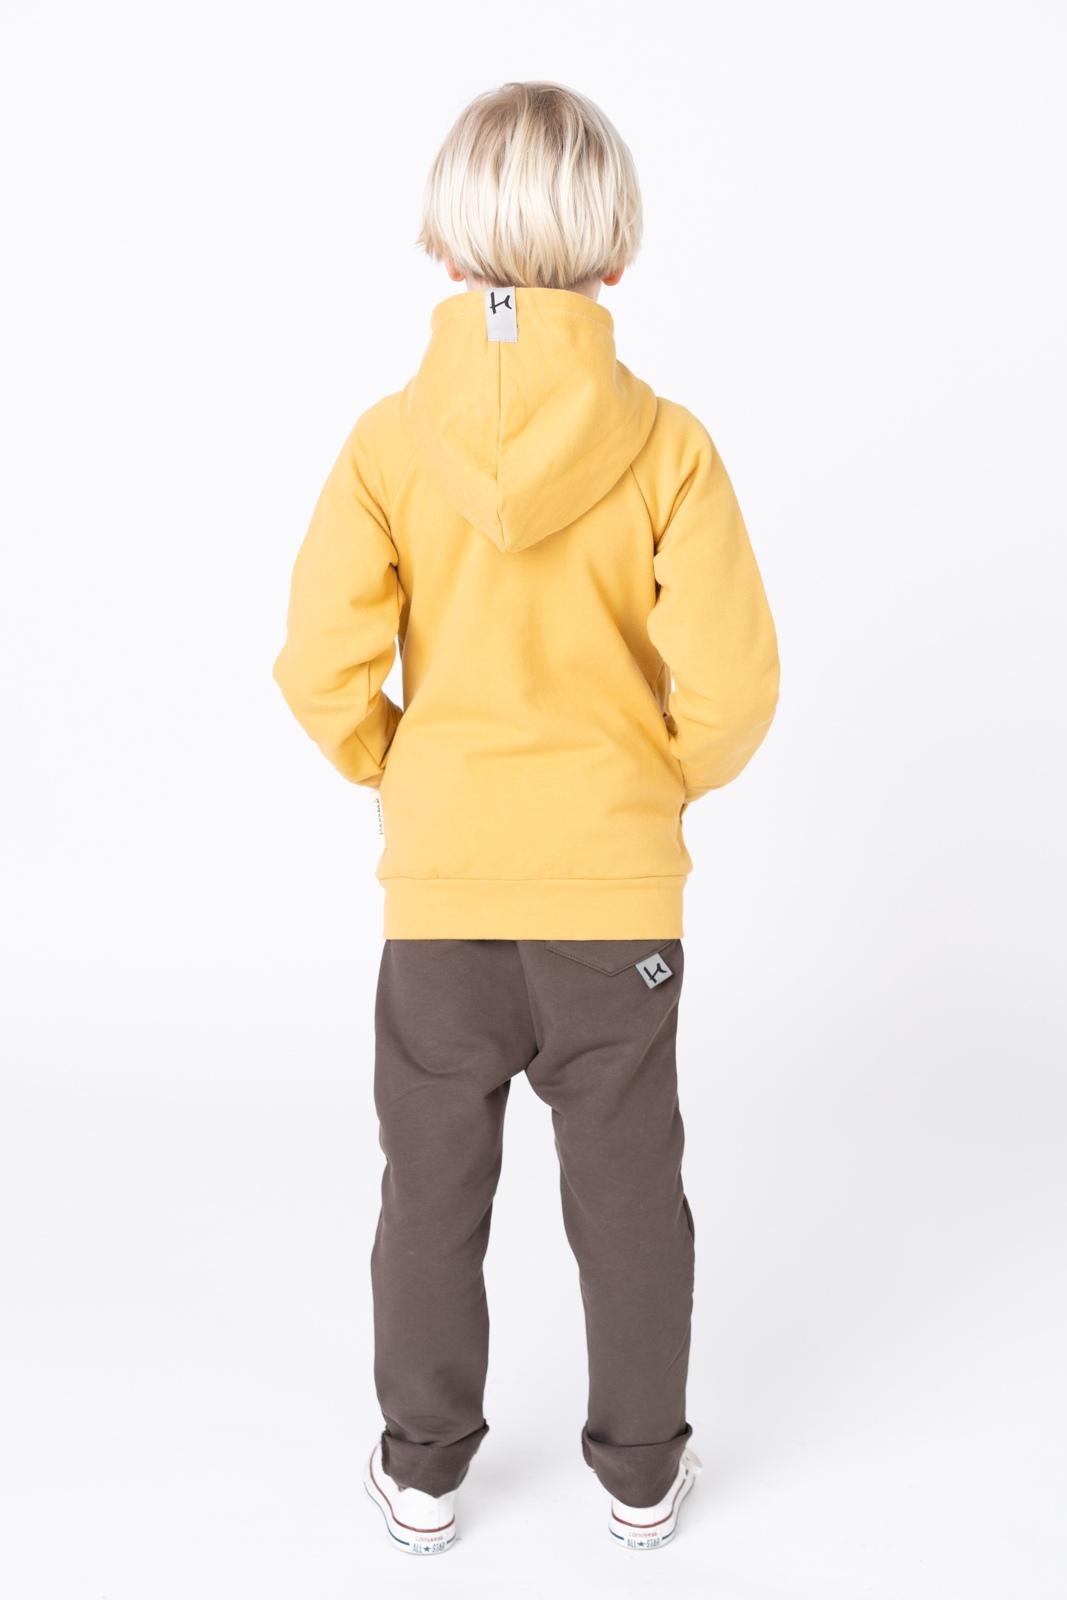 Tiesiog džemperis -50%  - 20